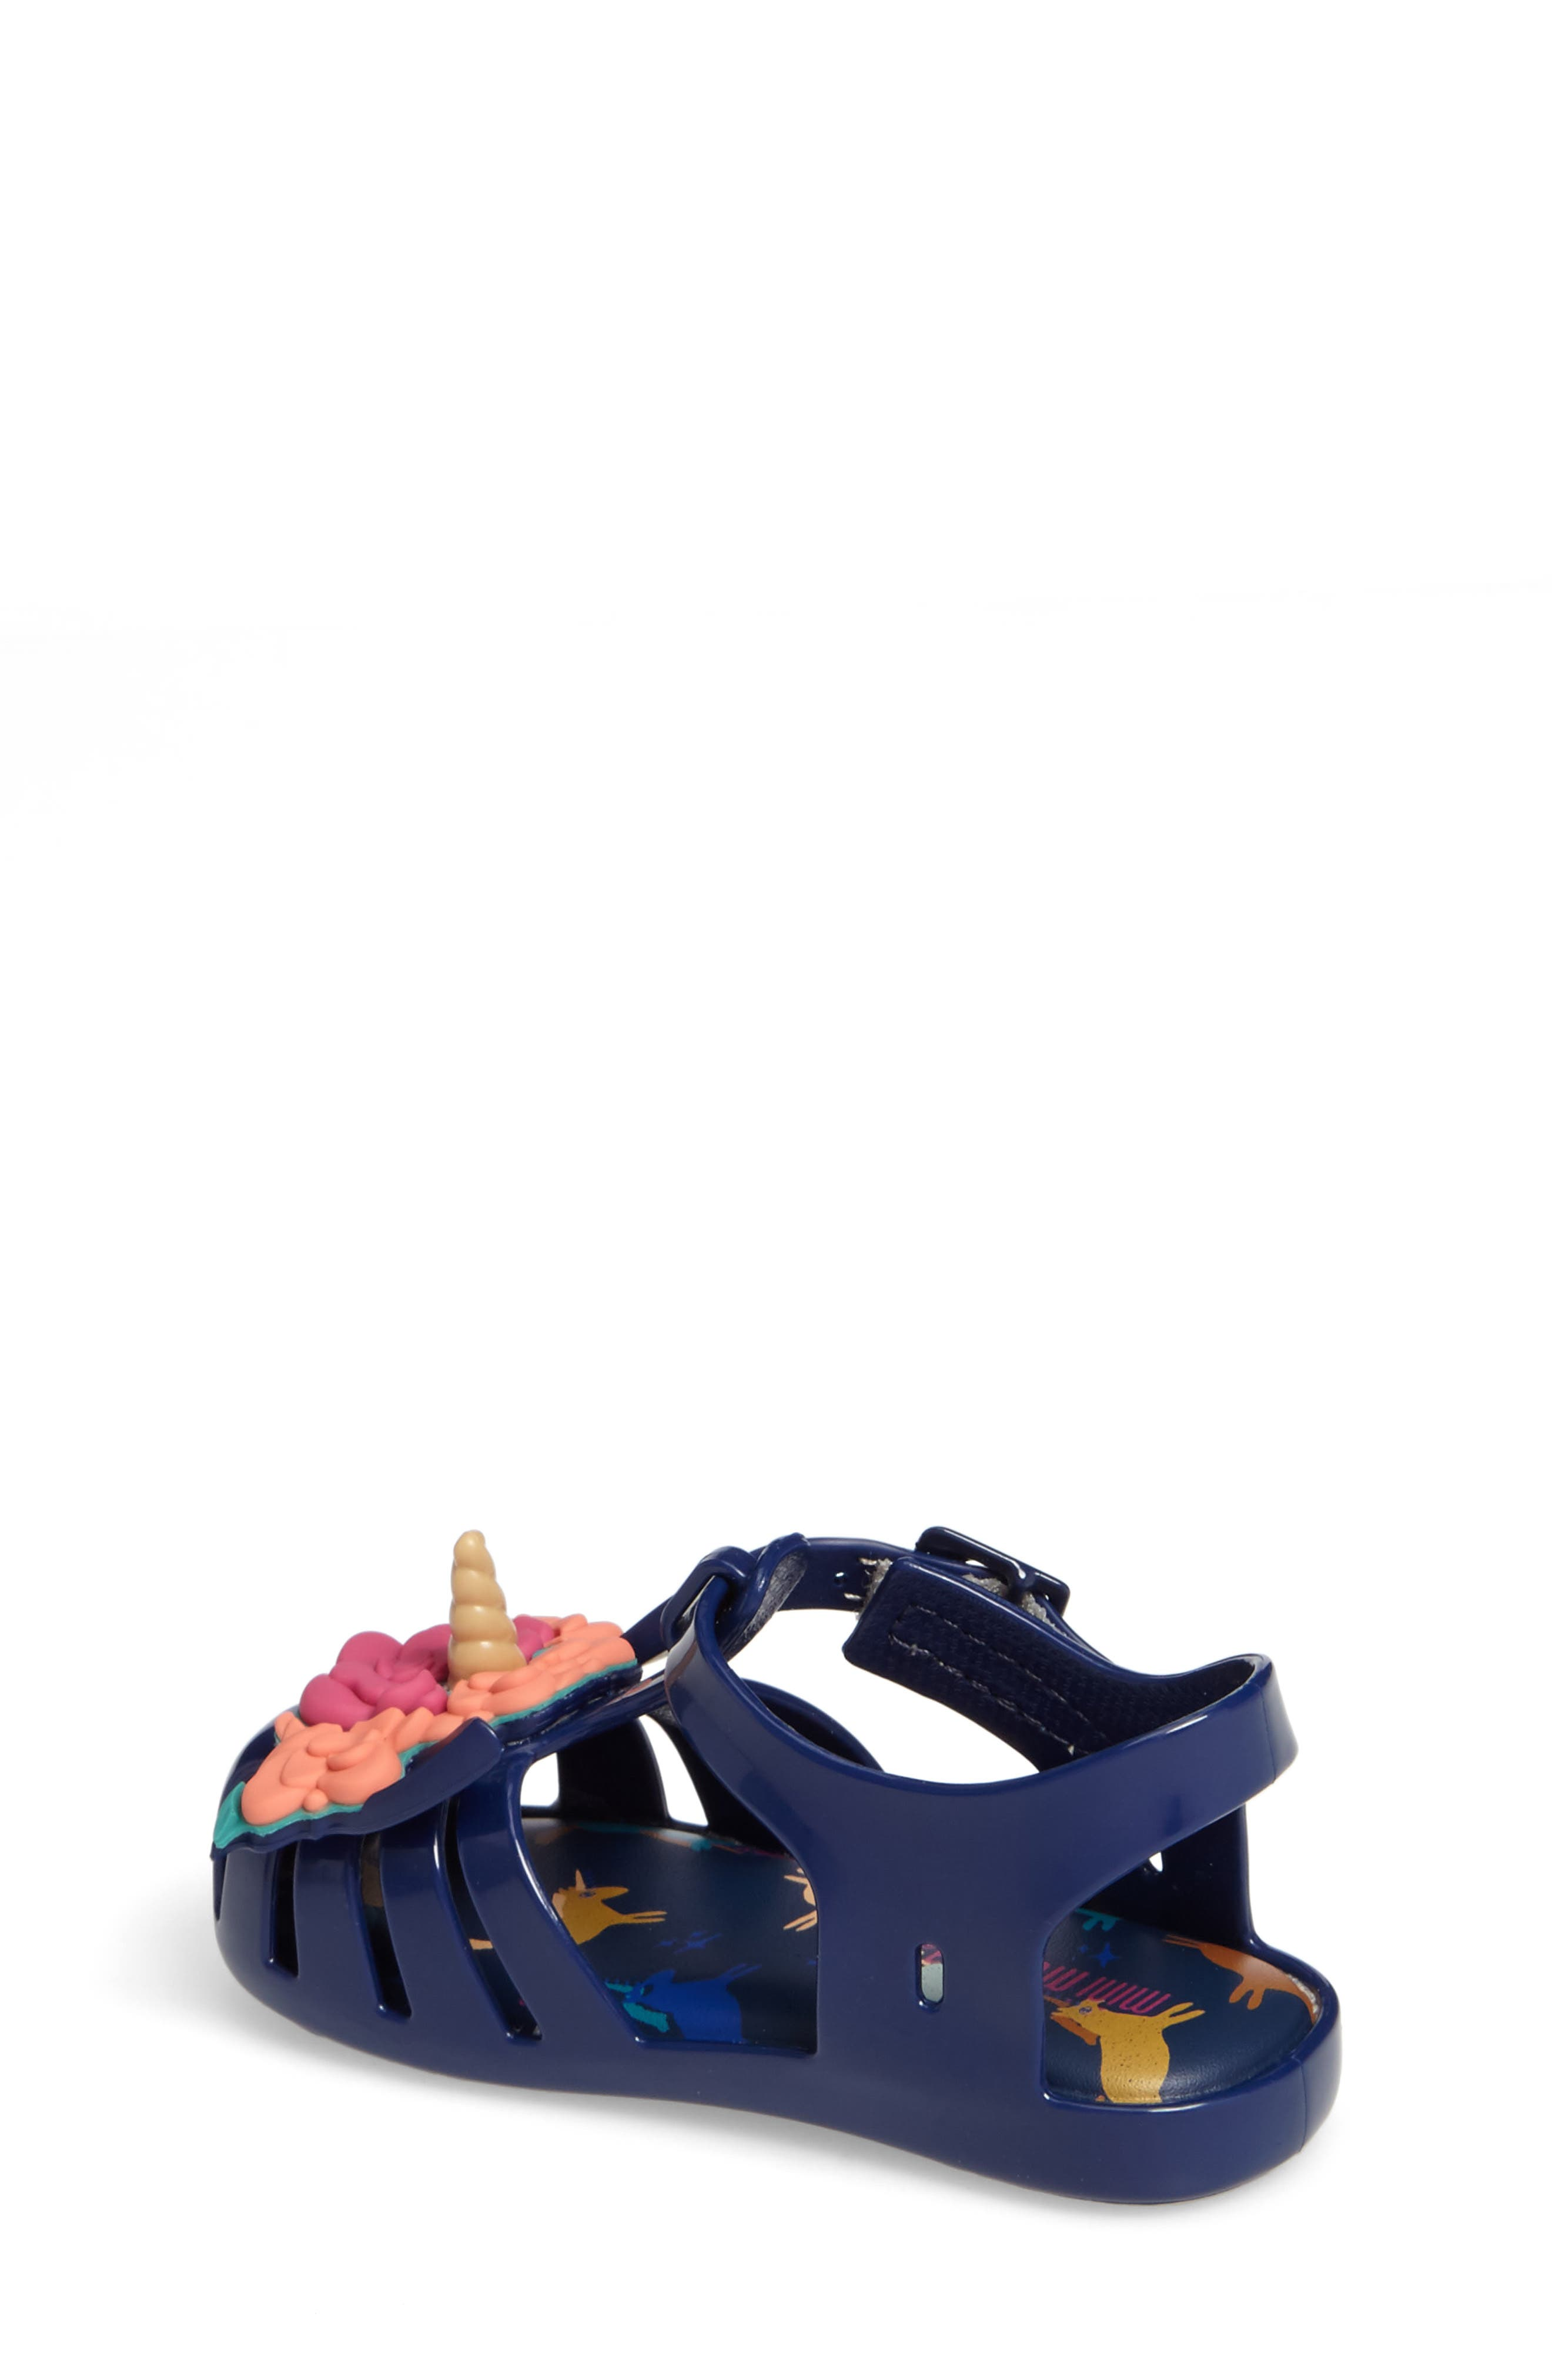 Alternate Image 2  - Mini Melissa Aranha Fabula Unicorn Sandal (Walker & Toddler)